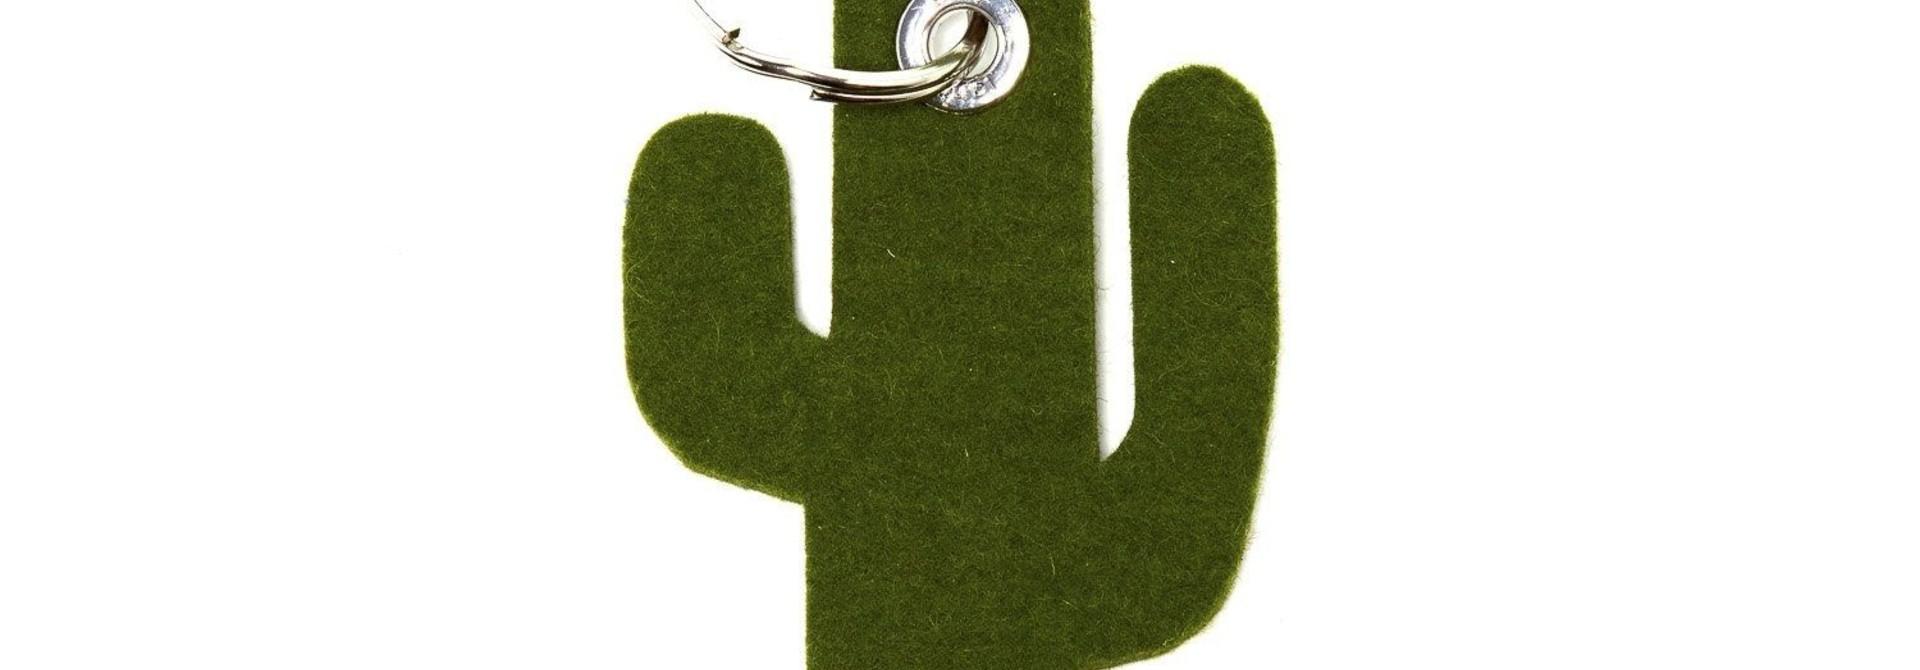 Key Fob -Cactus - Loden Green